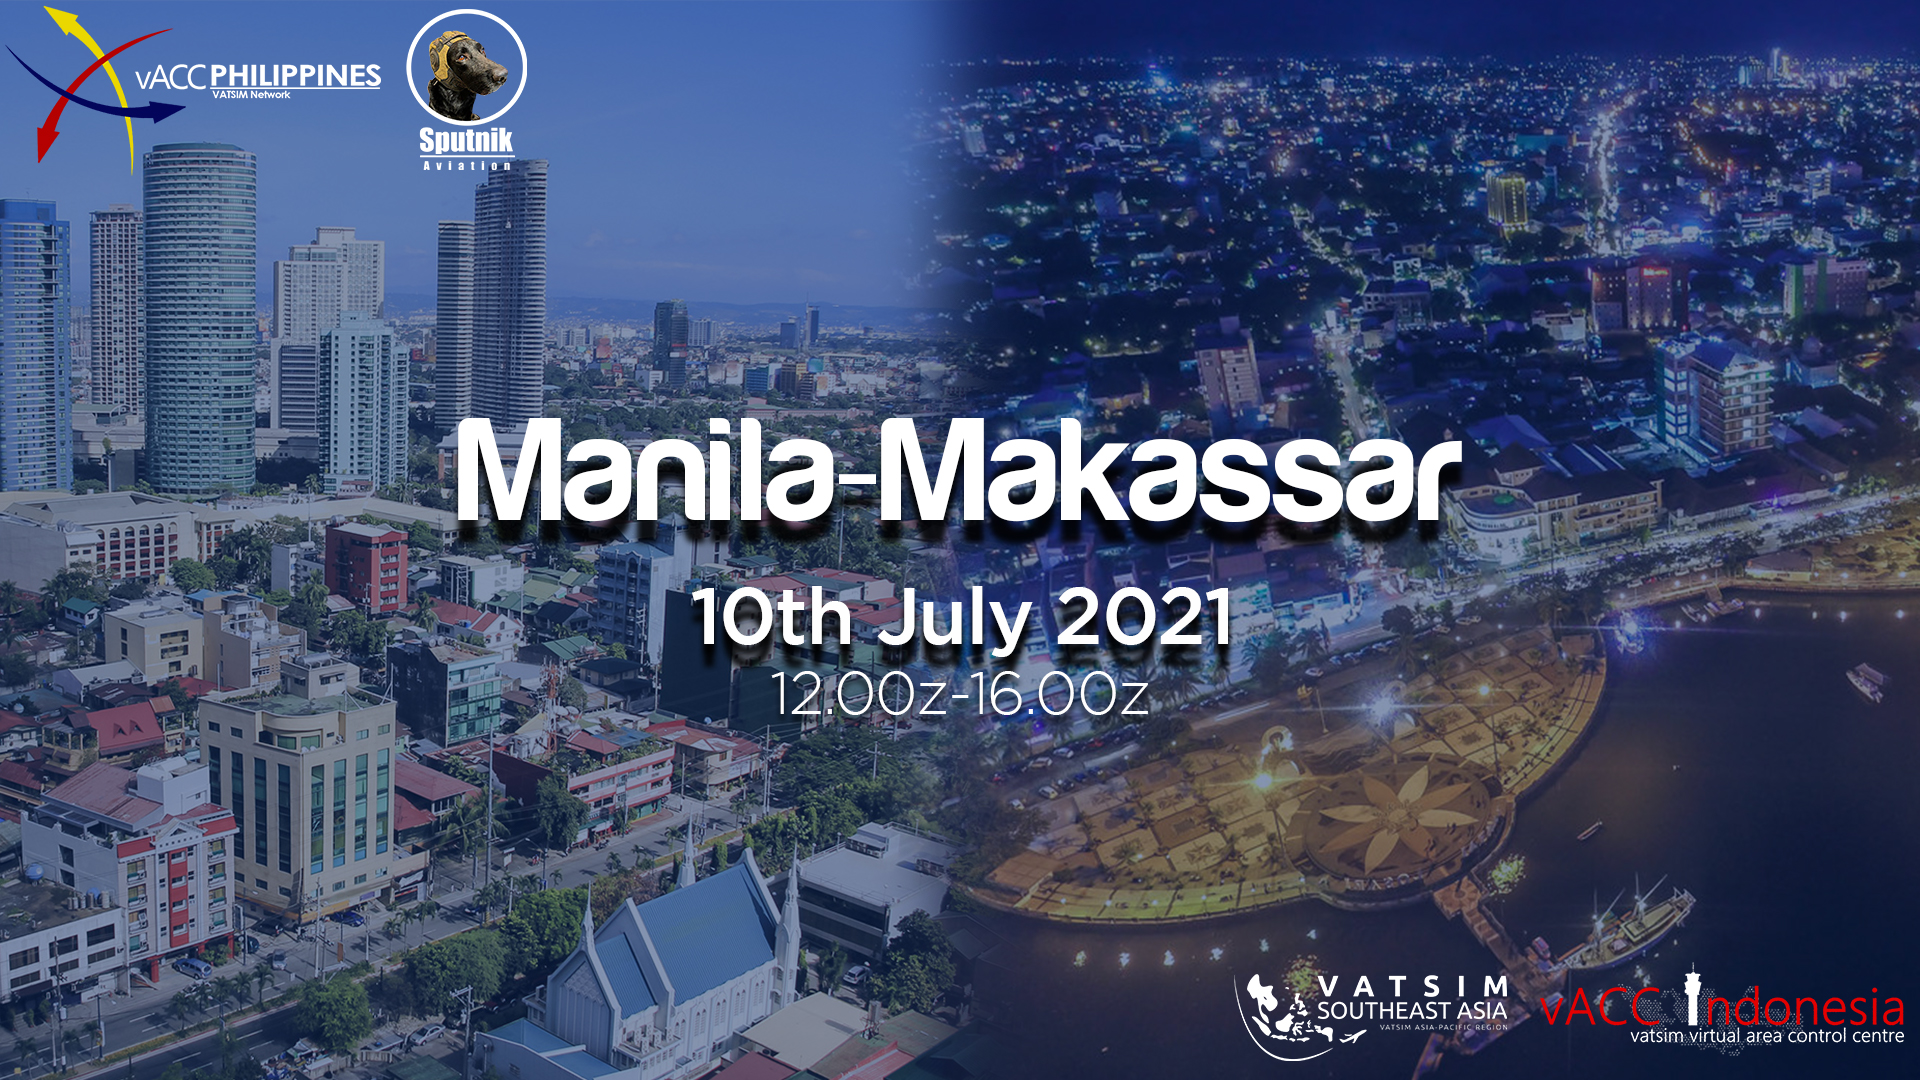 Manila - Makassar Citylink